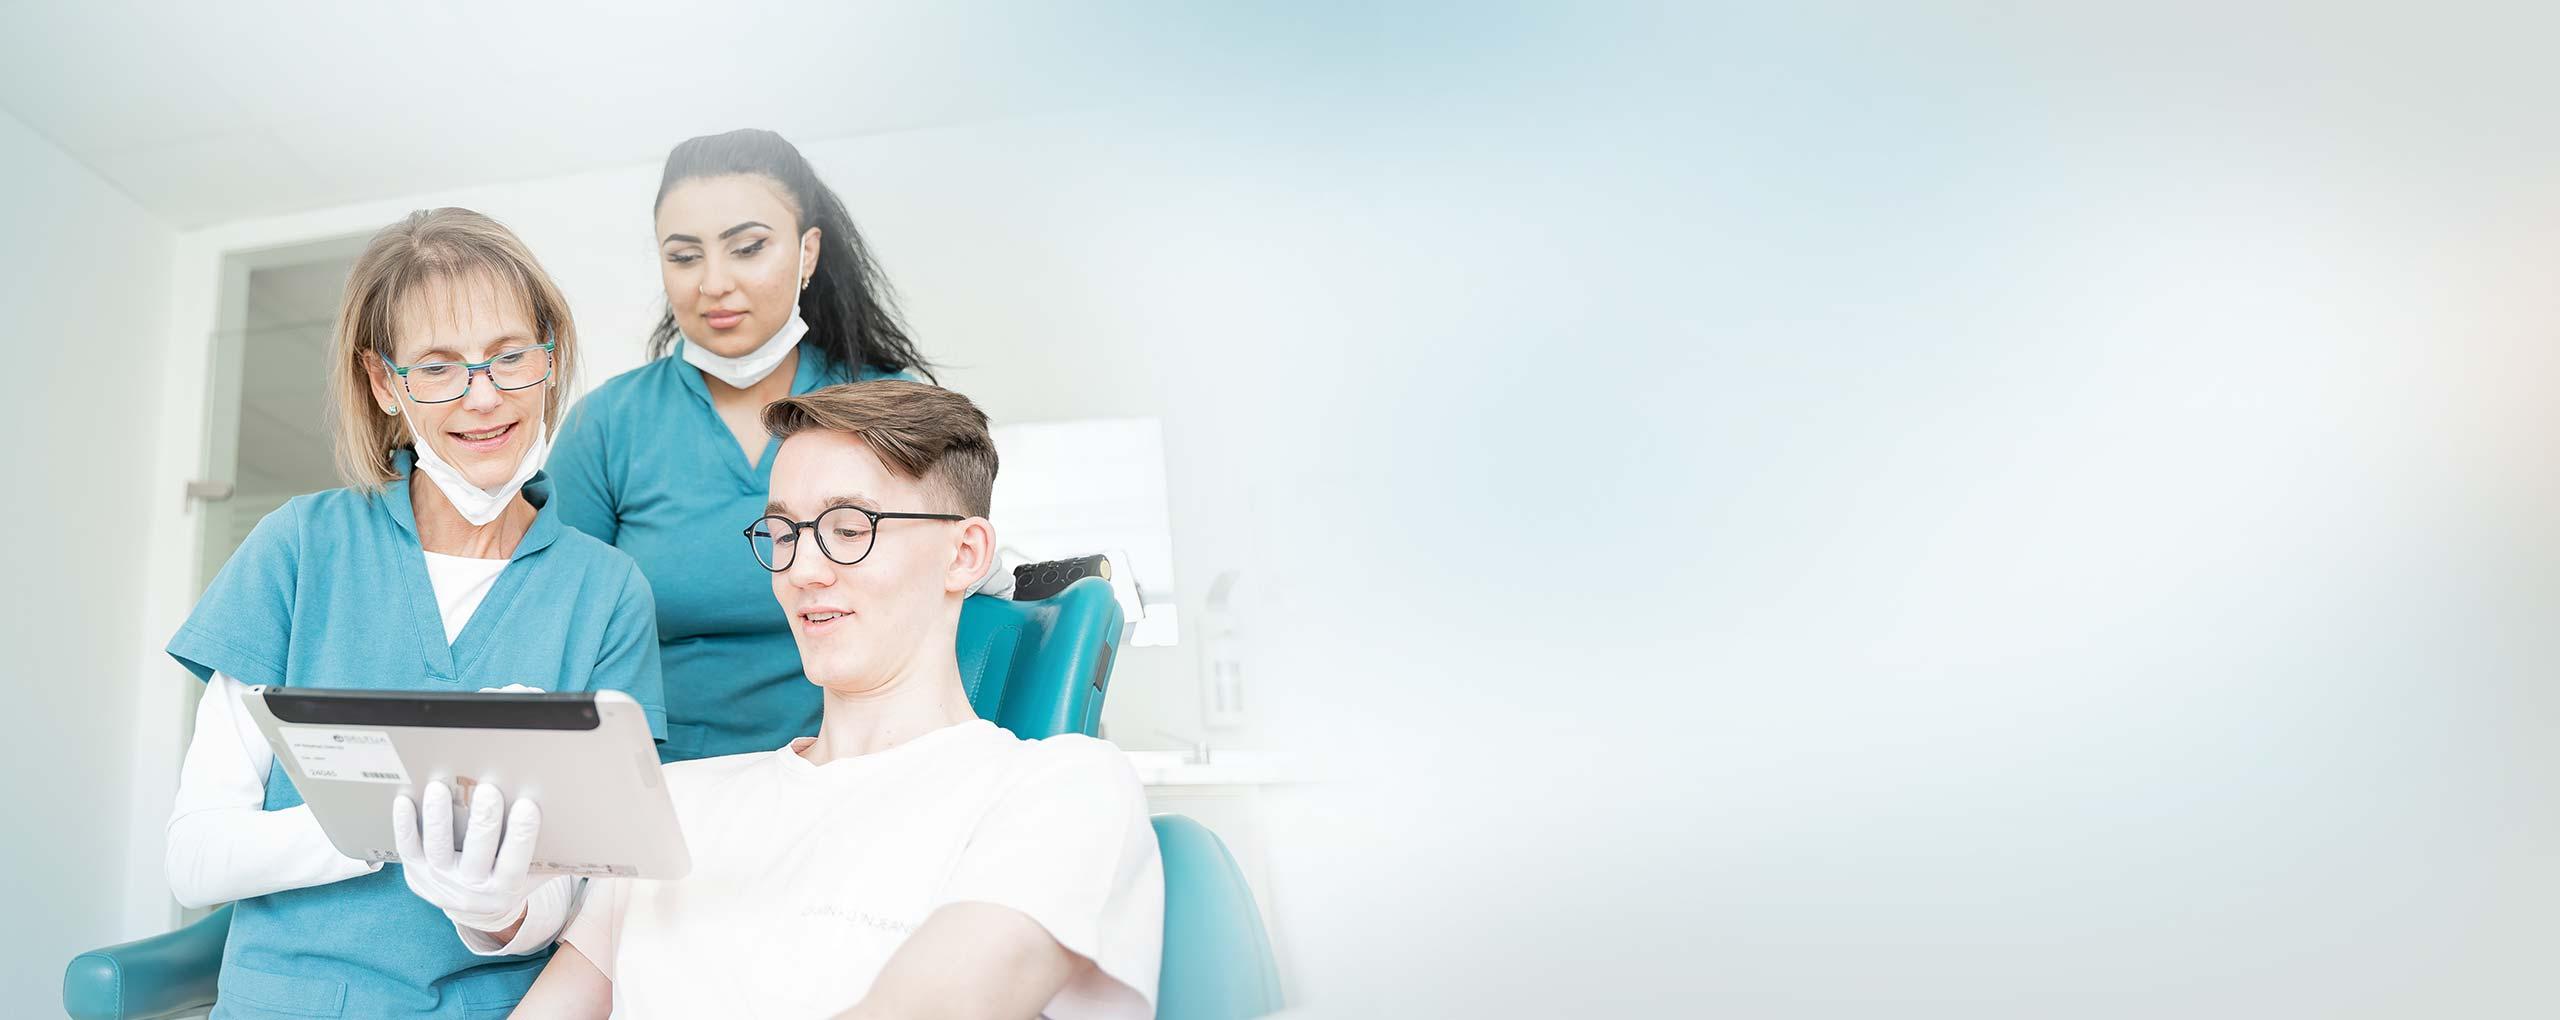 weickum zahnarzt mannheim behandlungsspektrum parodontitis